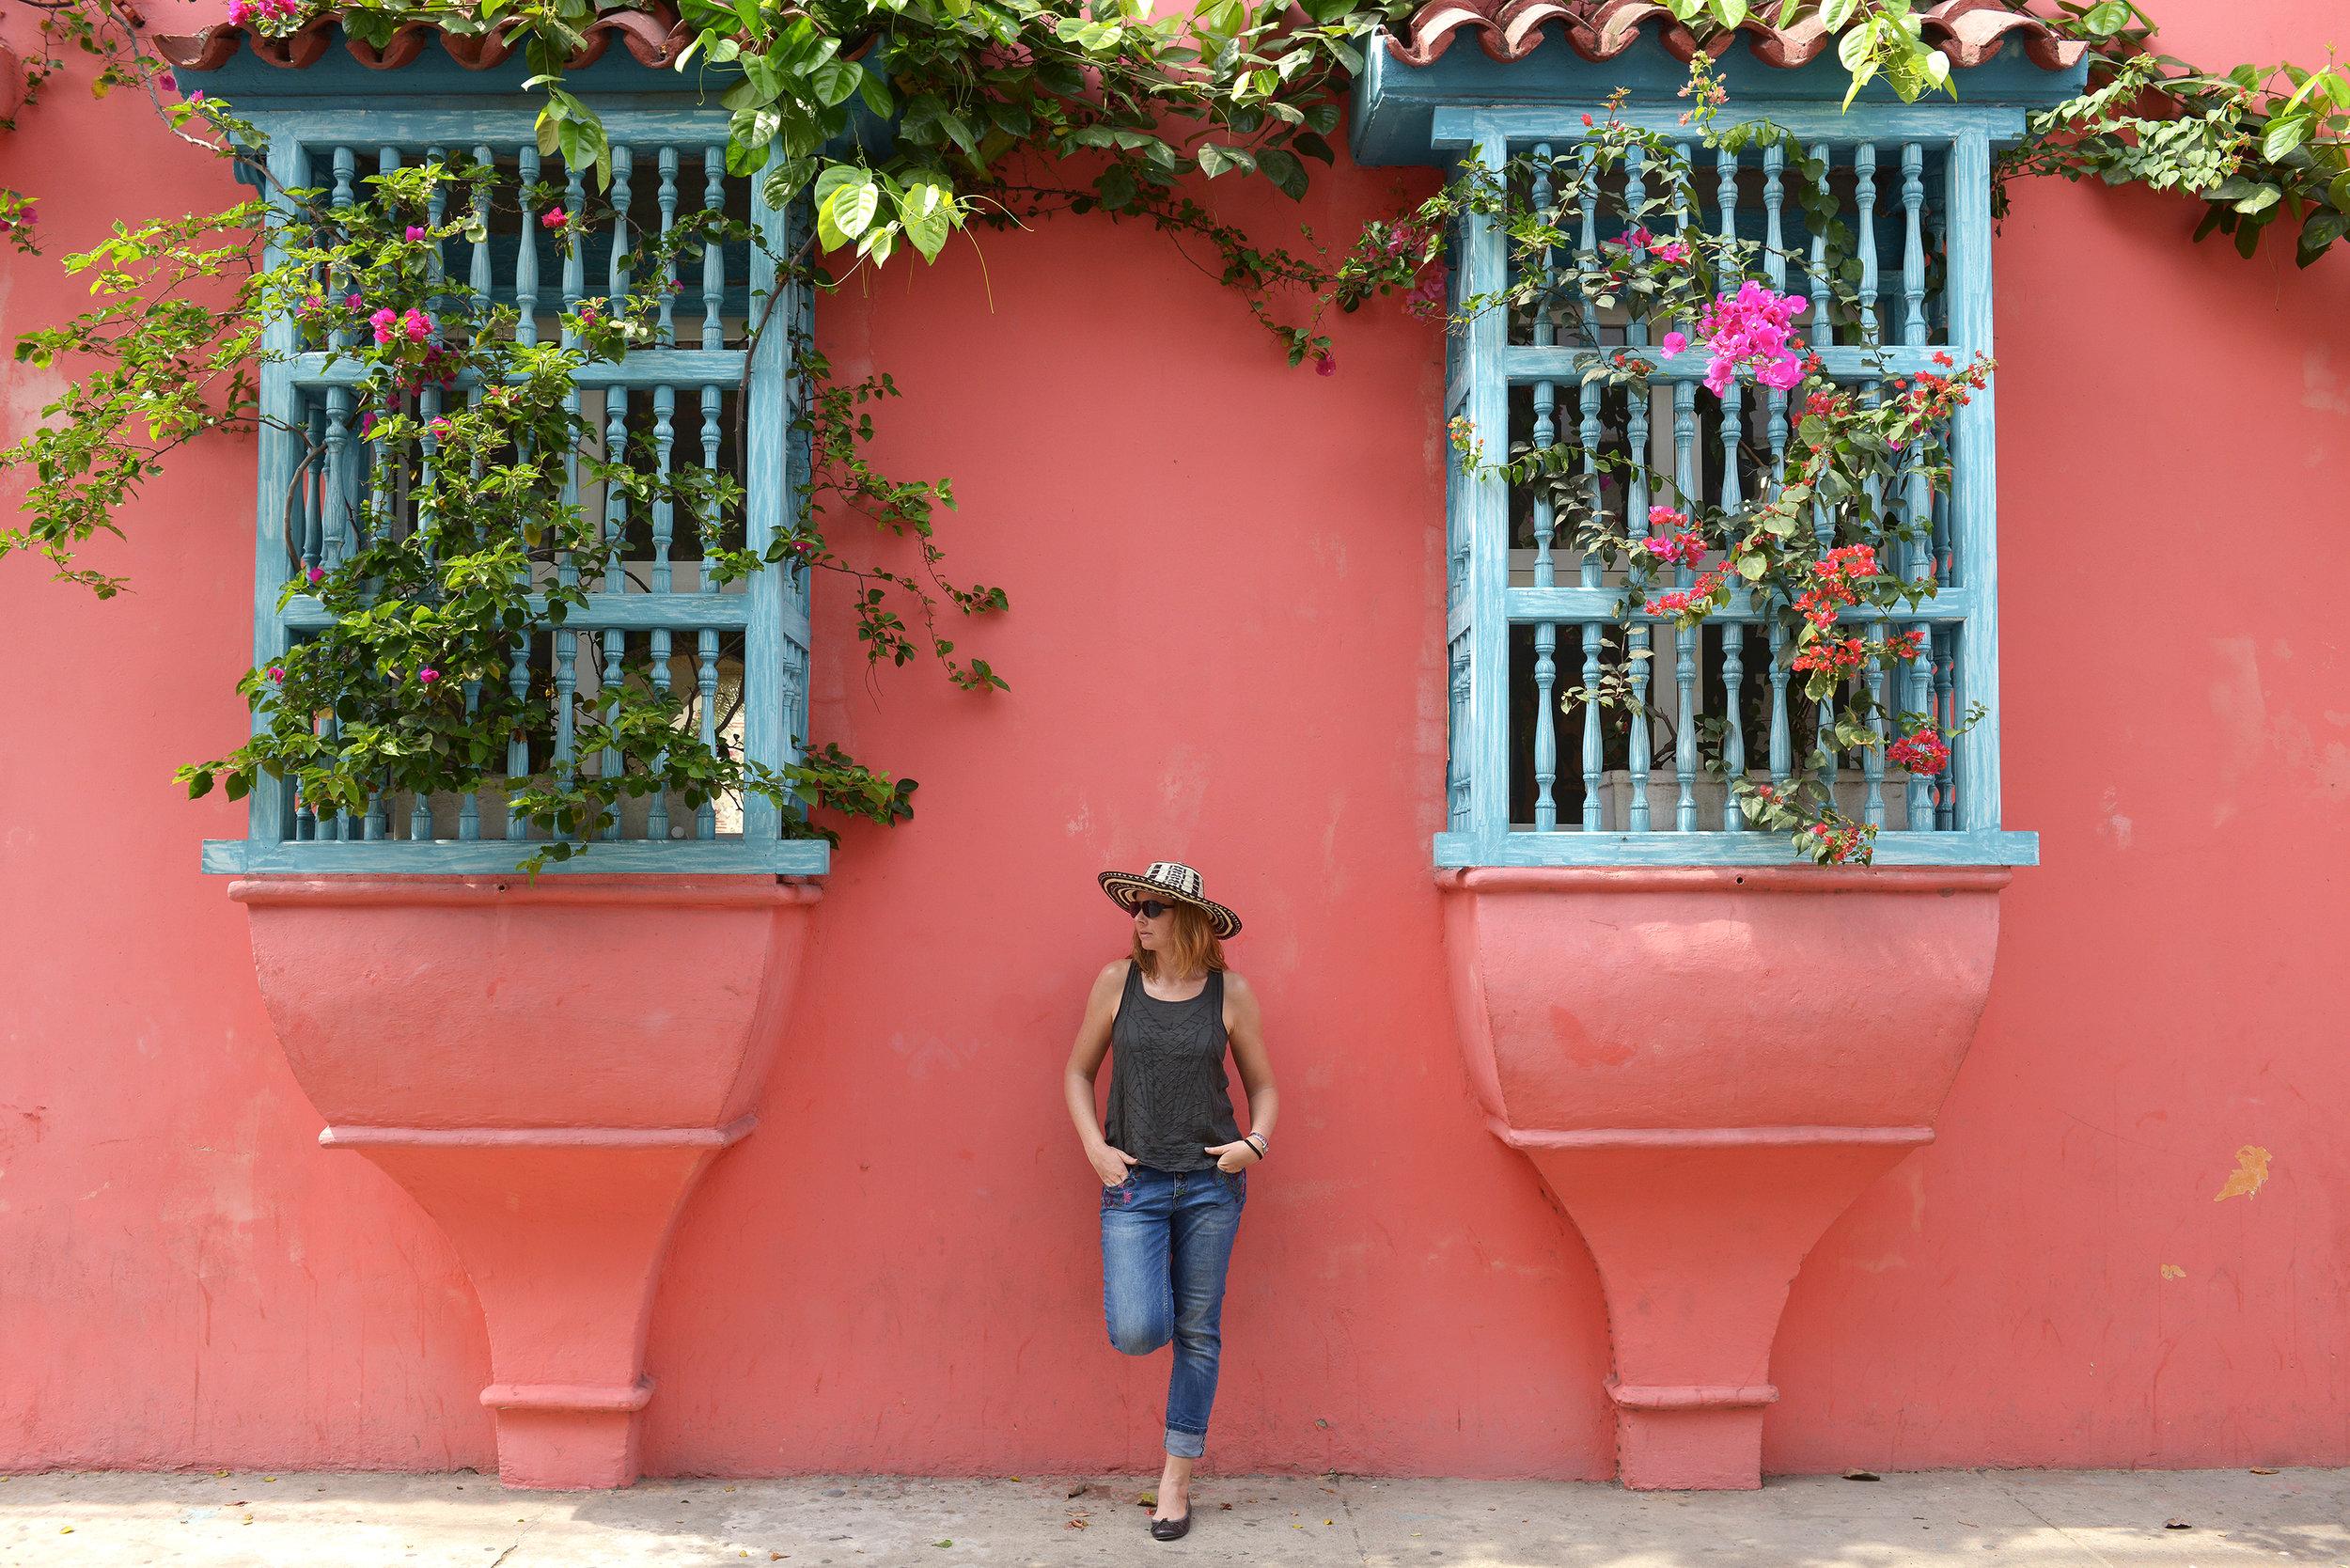 Cartagena, Cartagena de Indias, Kolombia, Karibia, vanhakaupunki